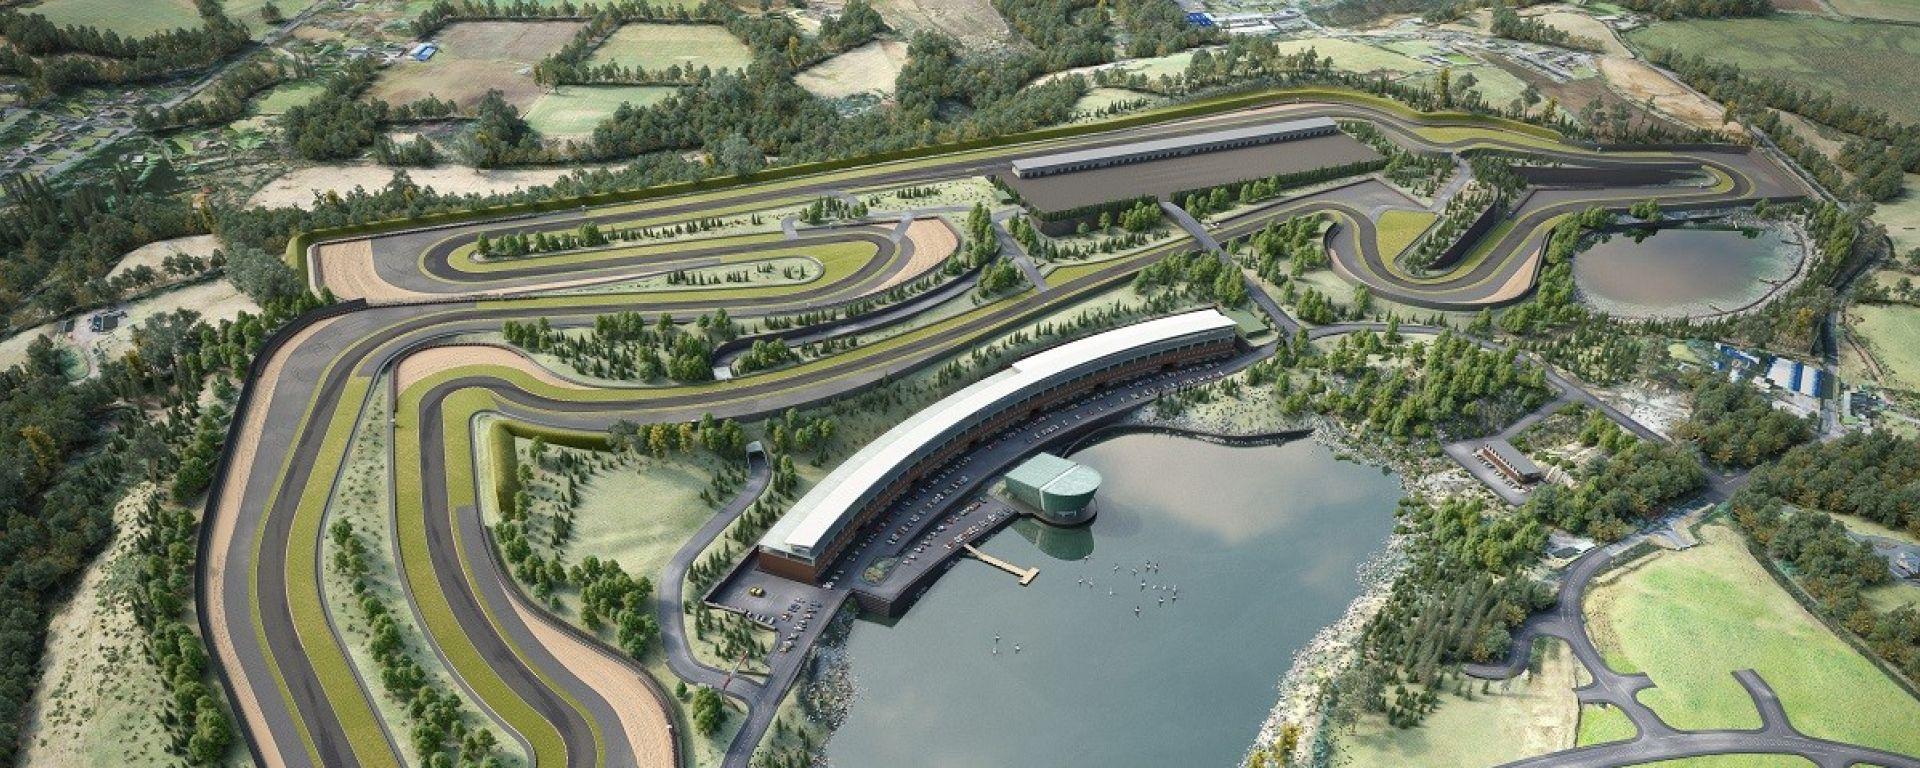 SBK Lake Torrent Circuit (Irlanda del Nord)